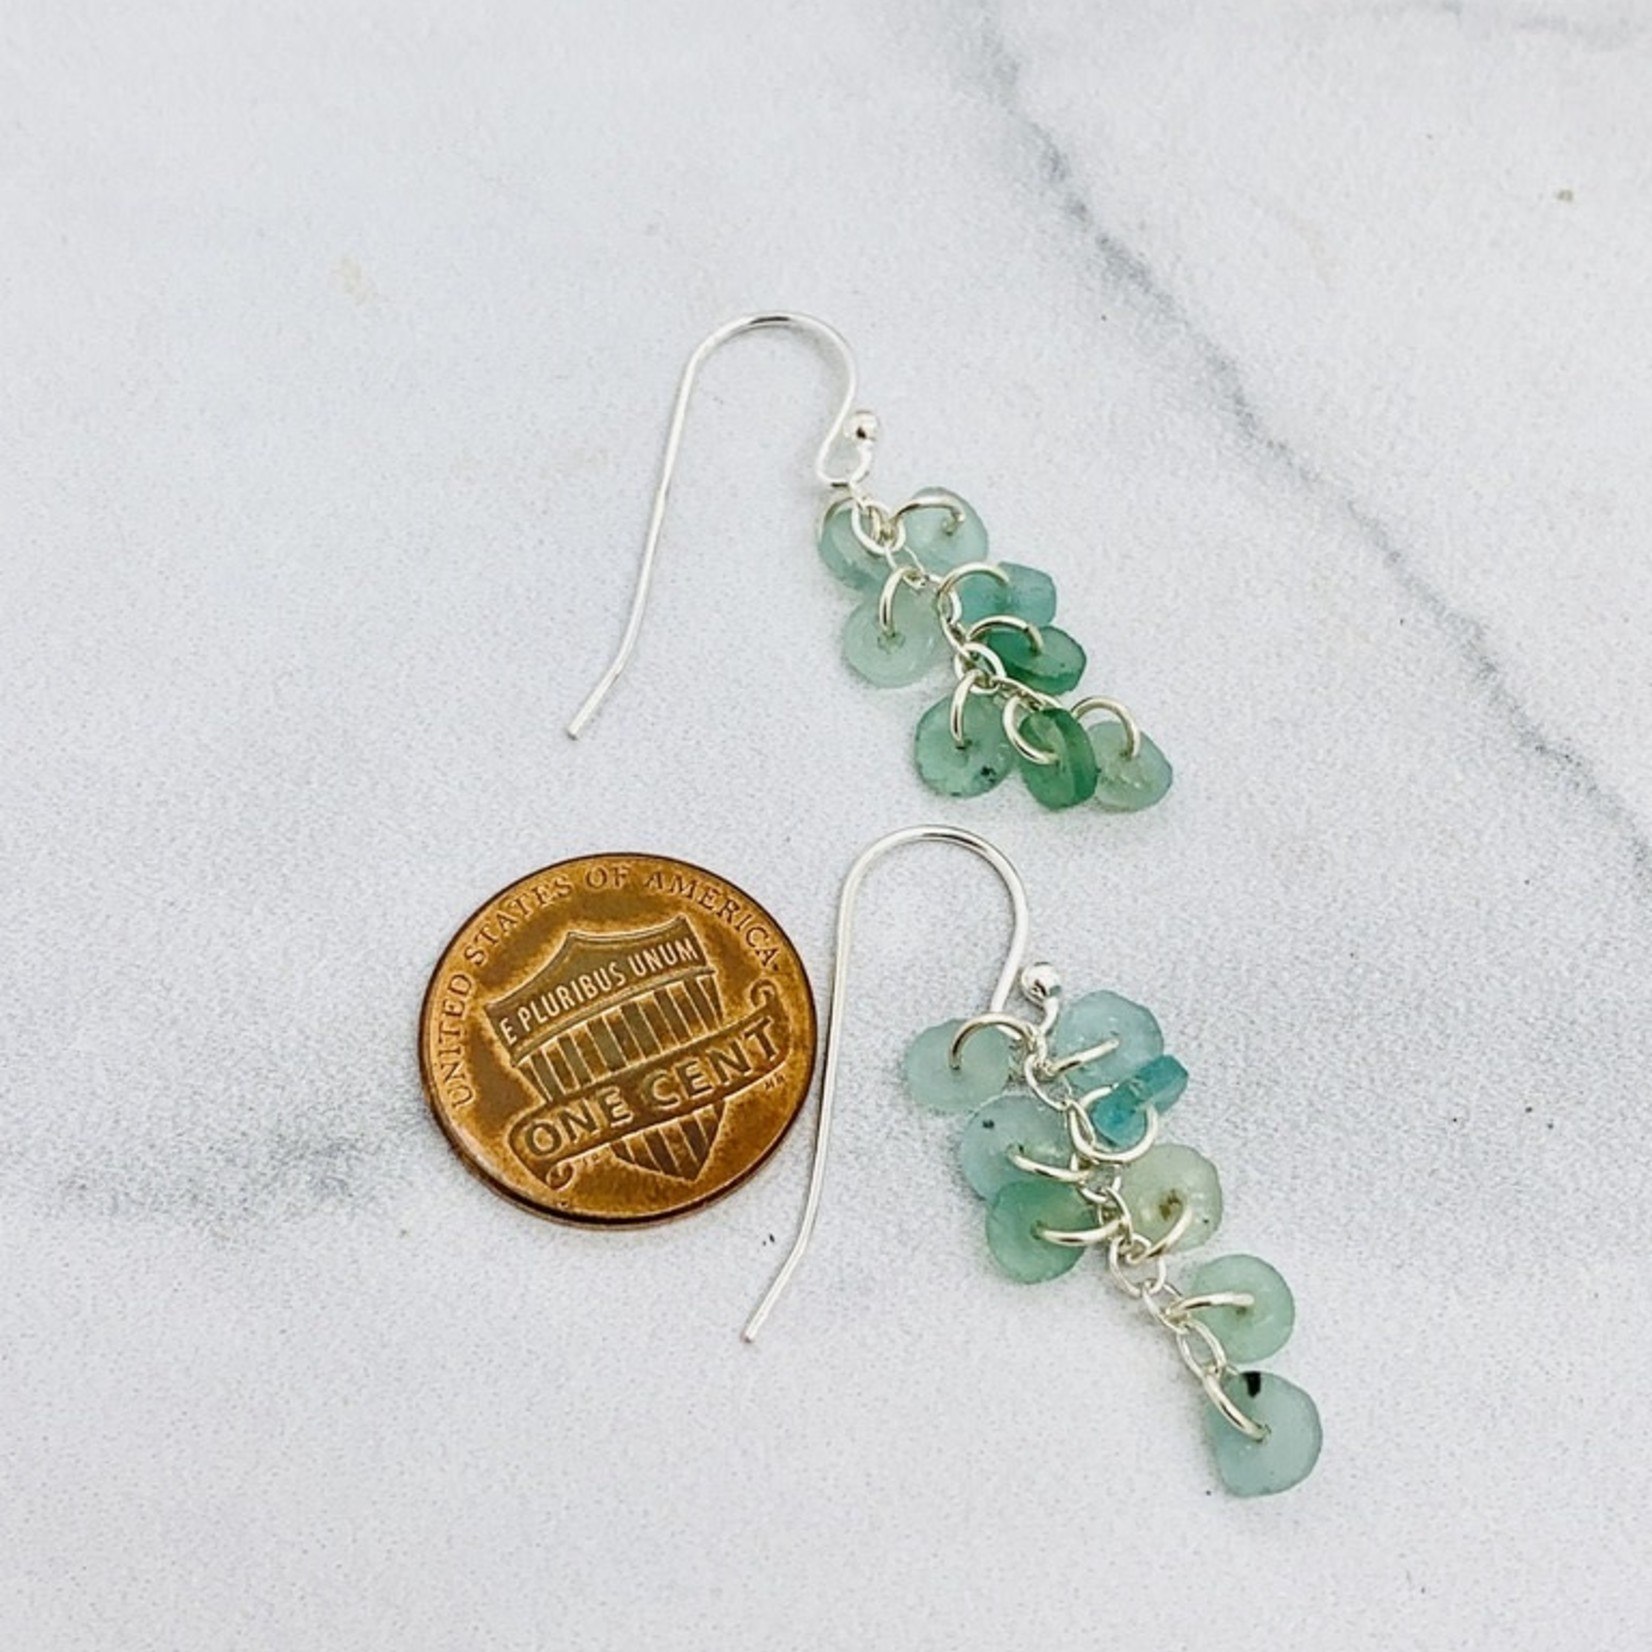 Handmade earrings with 8 roman sea glass discs on chain